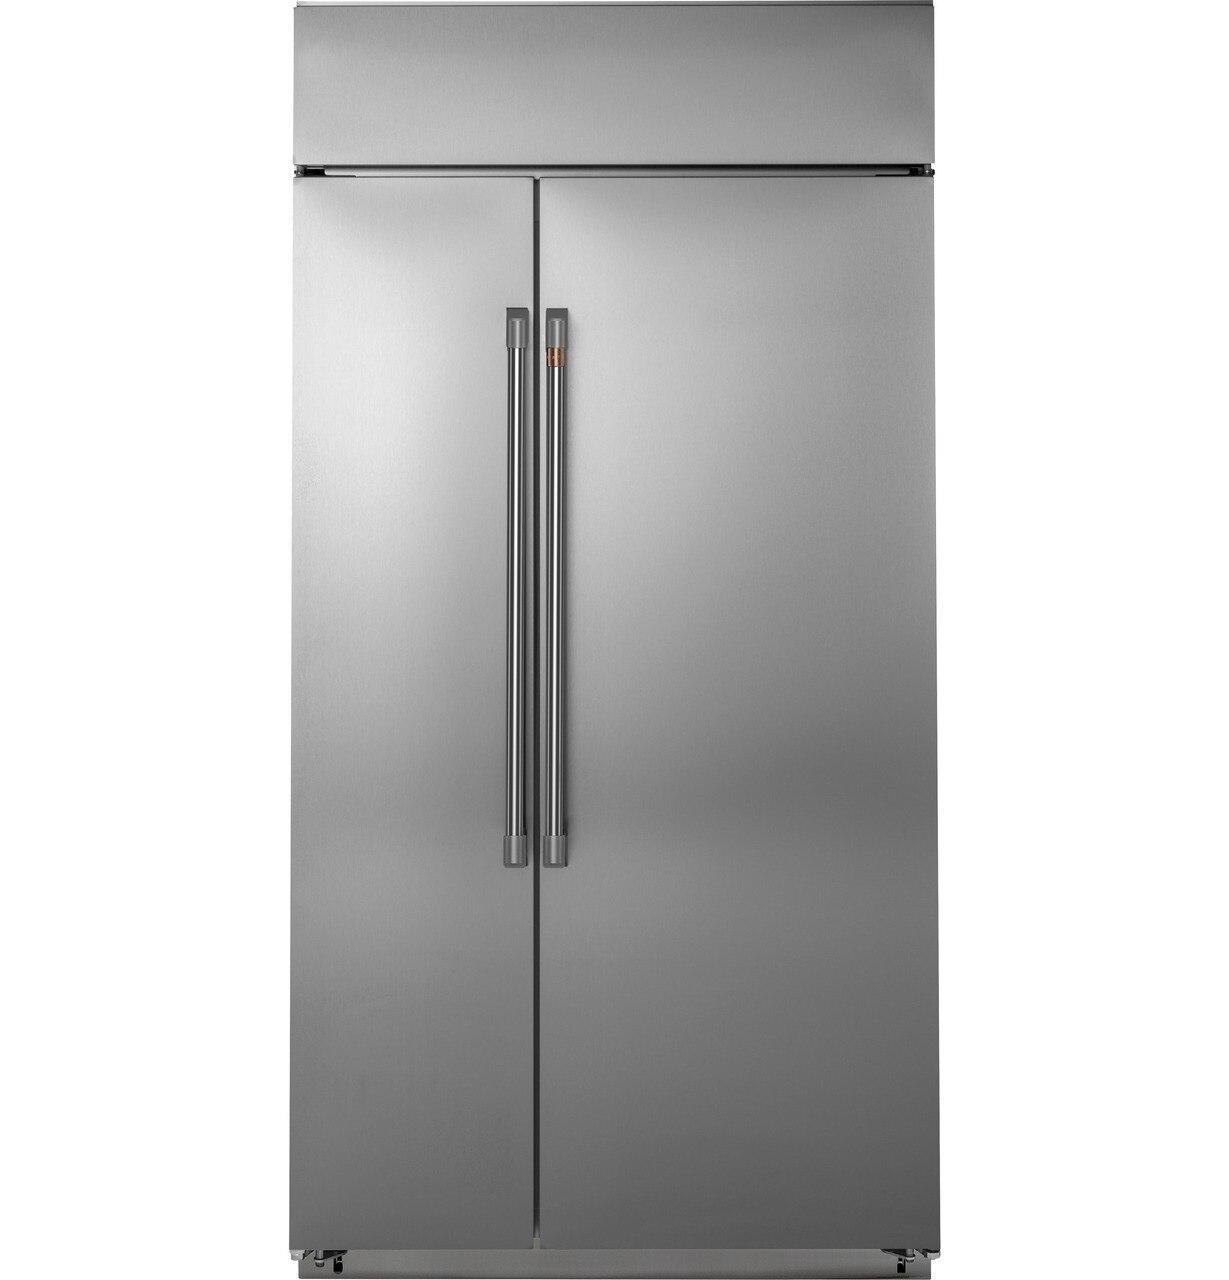 "Cafe Appliances42"" Smart Built-In Side-By-Side Refrigerator"